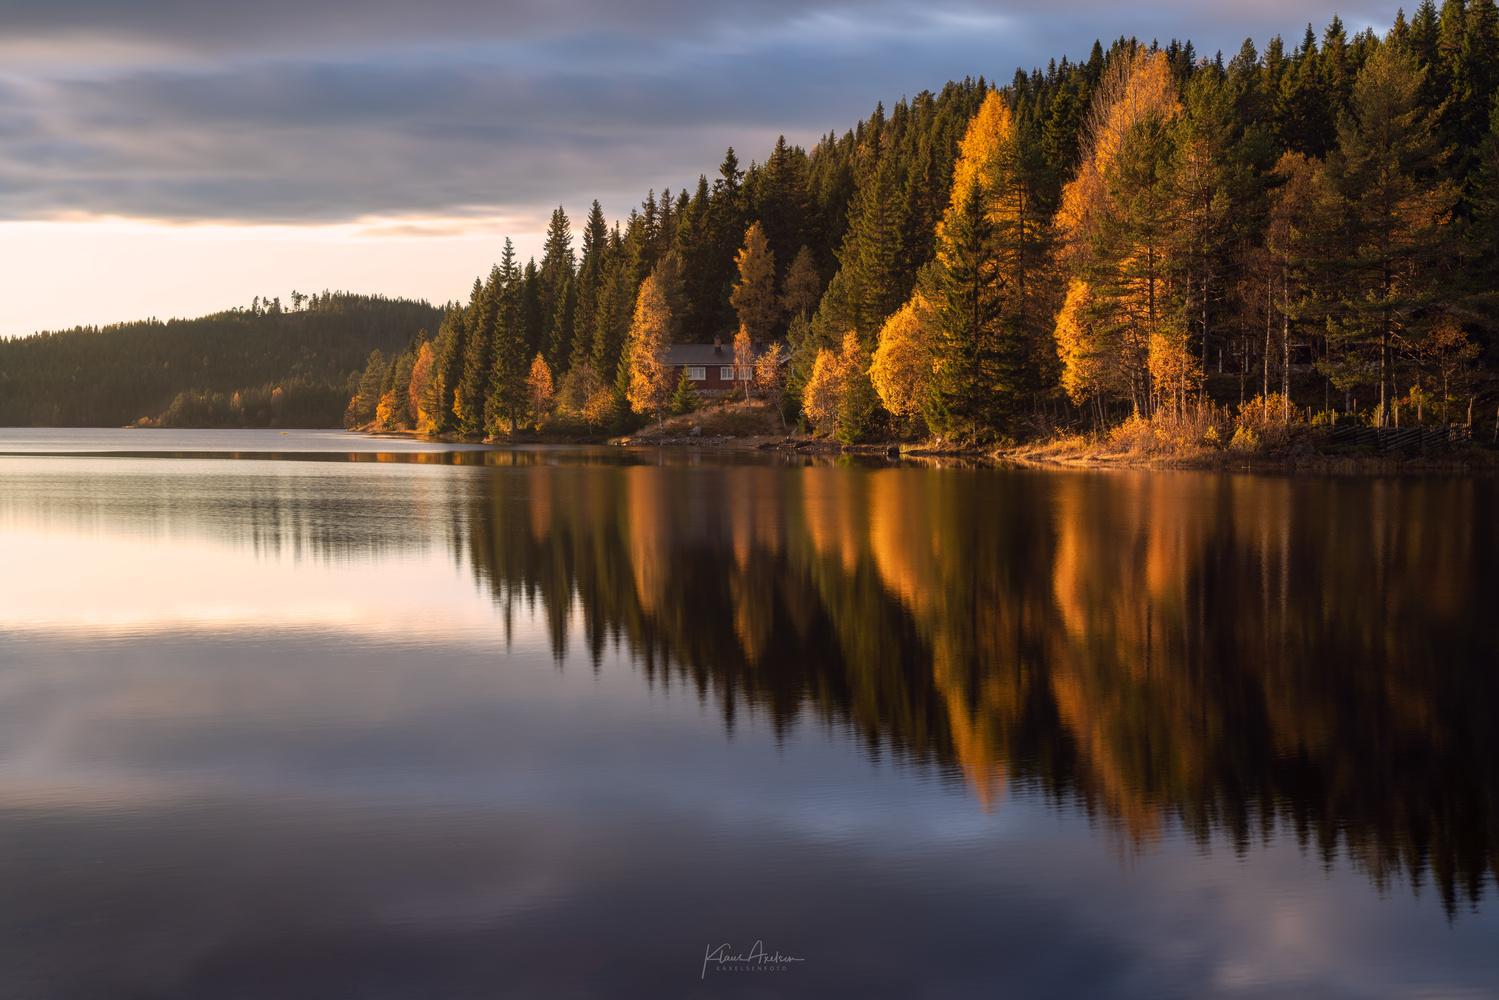 """Autumn glow"" by Klaus Axelsen"